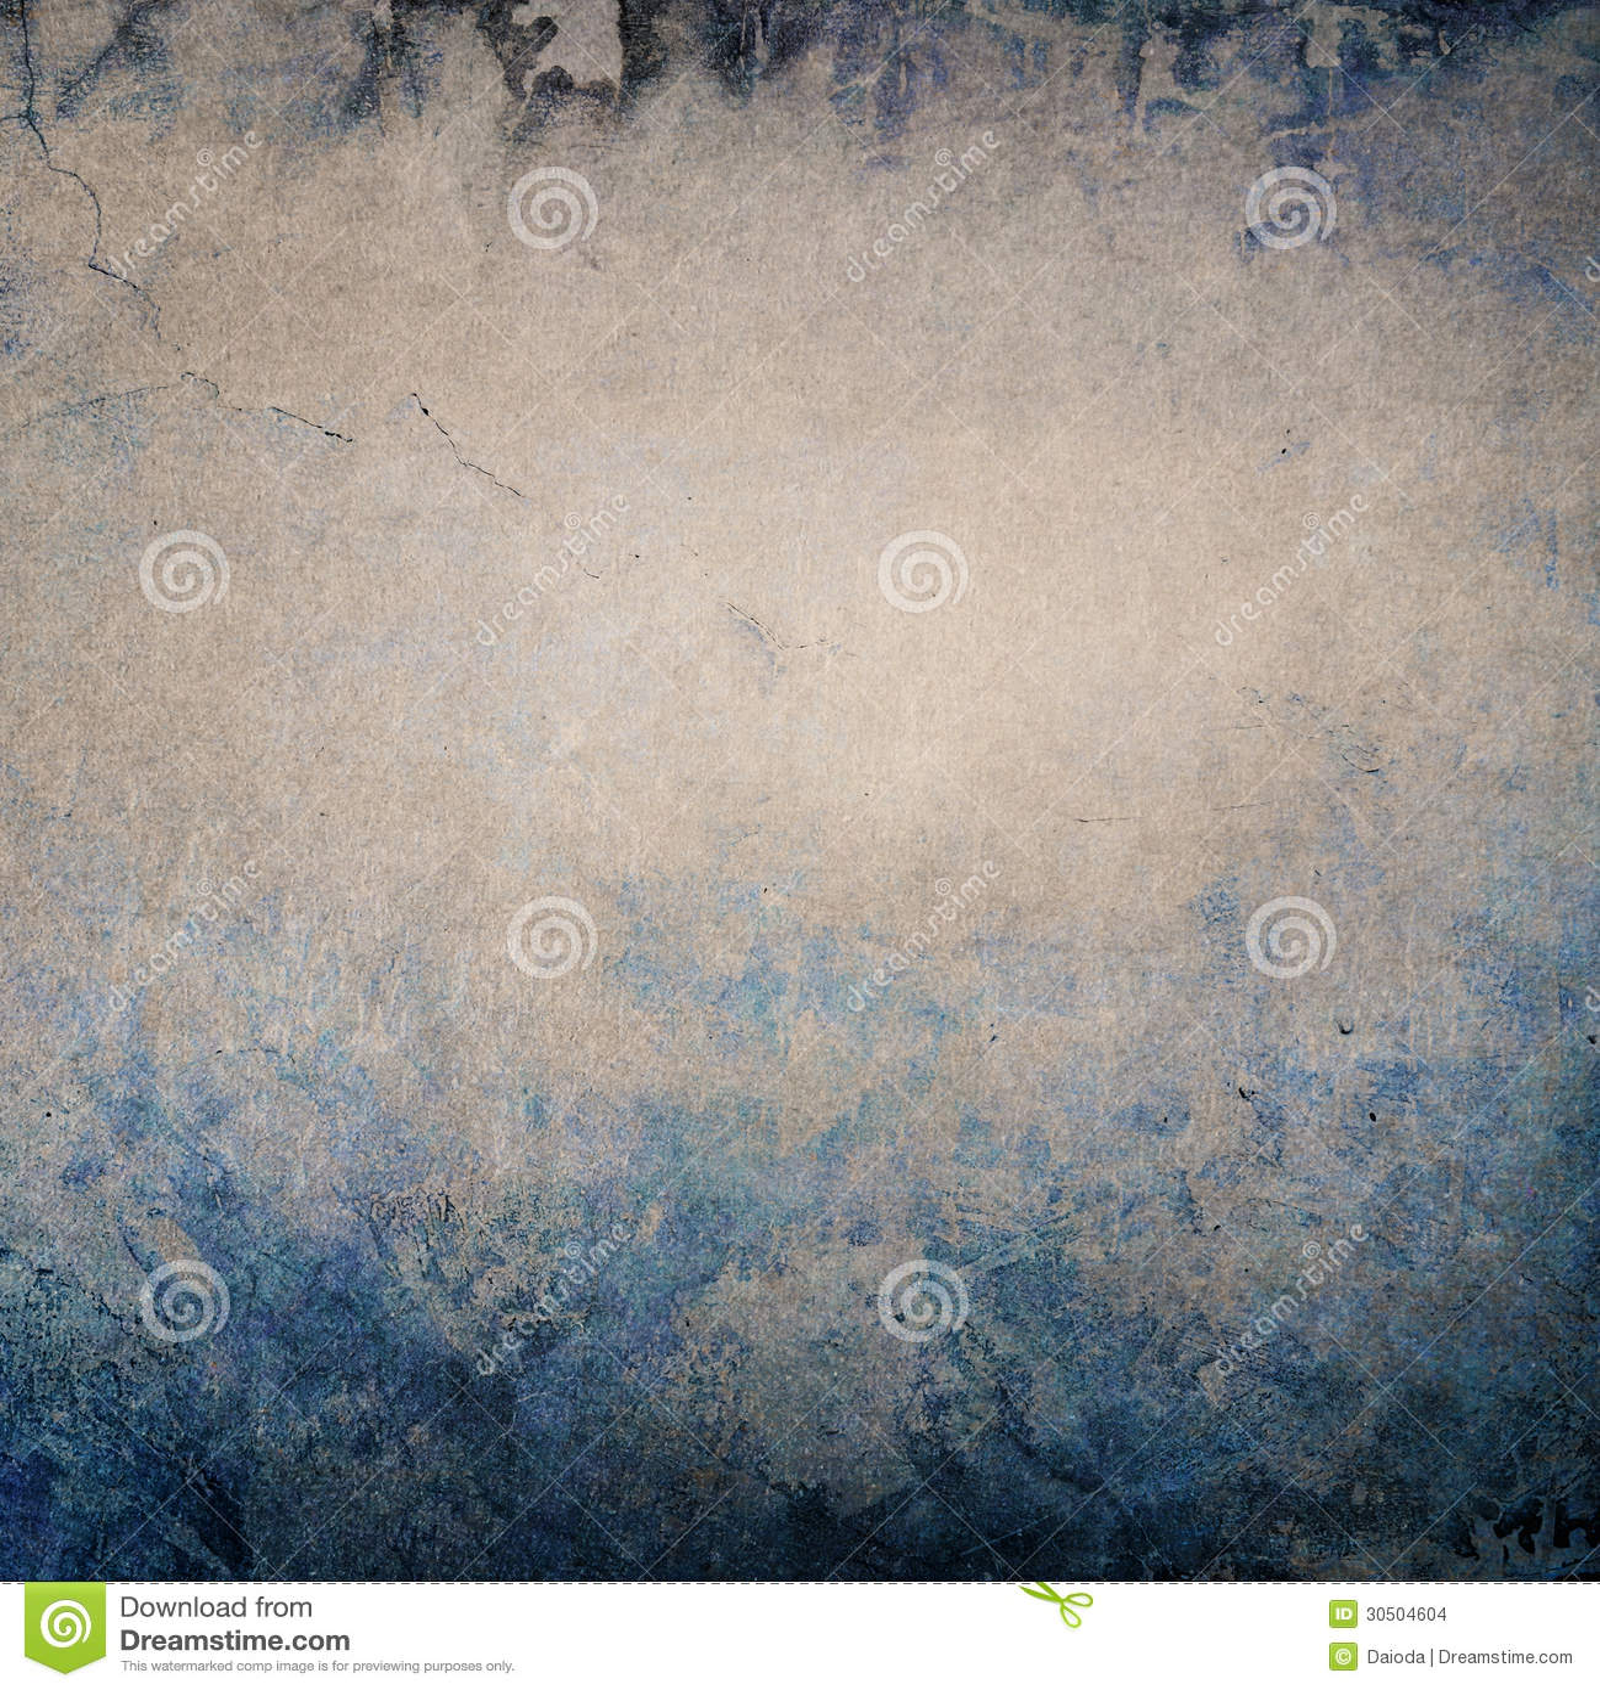 Aged blue - grey background